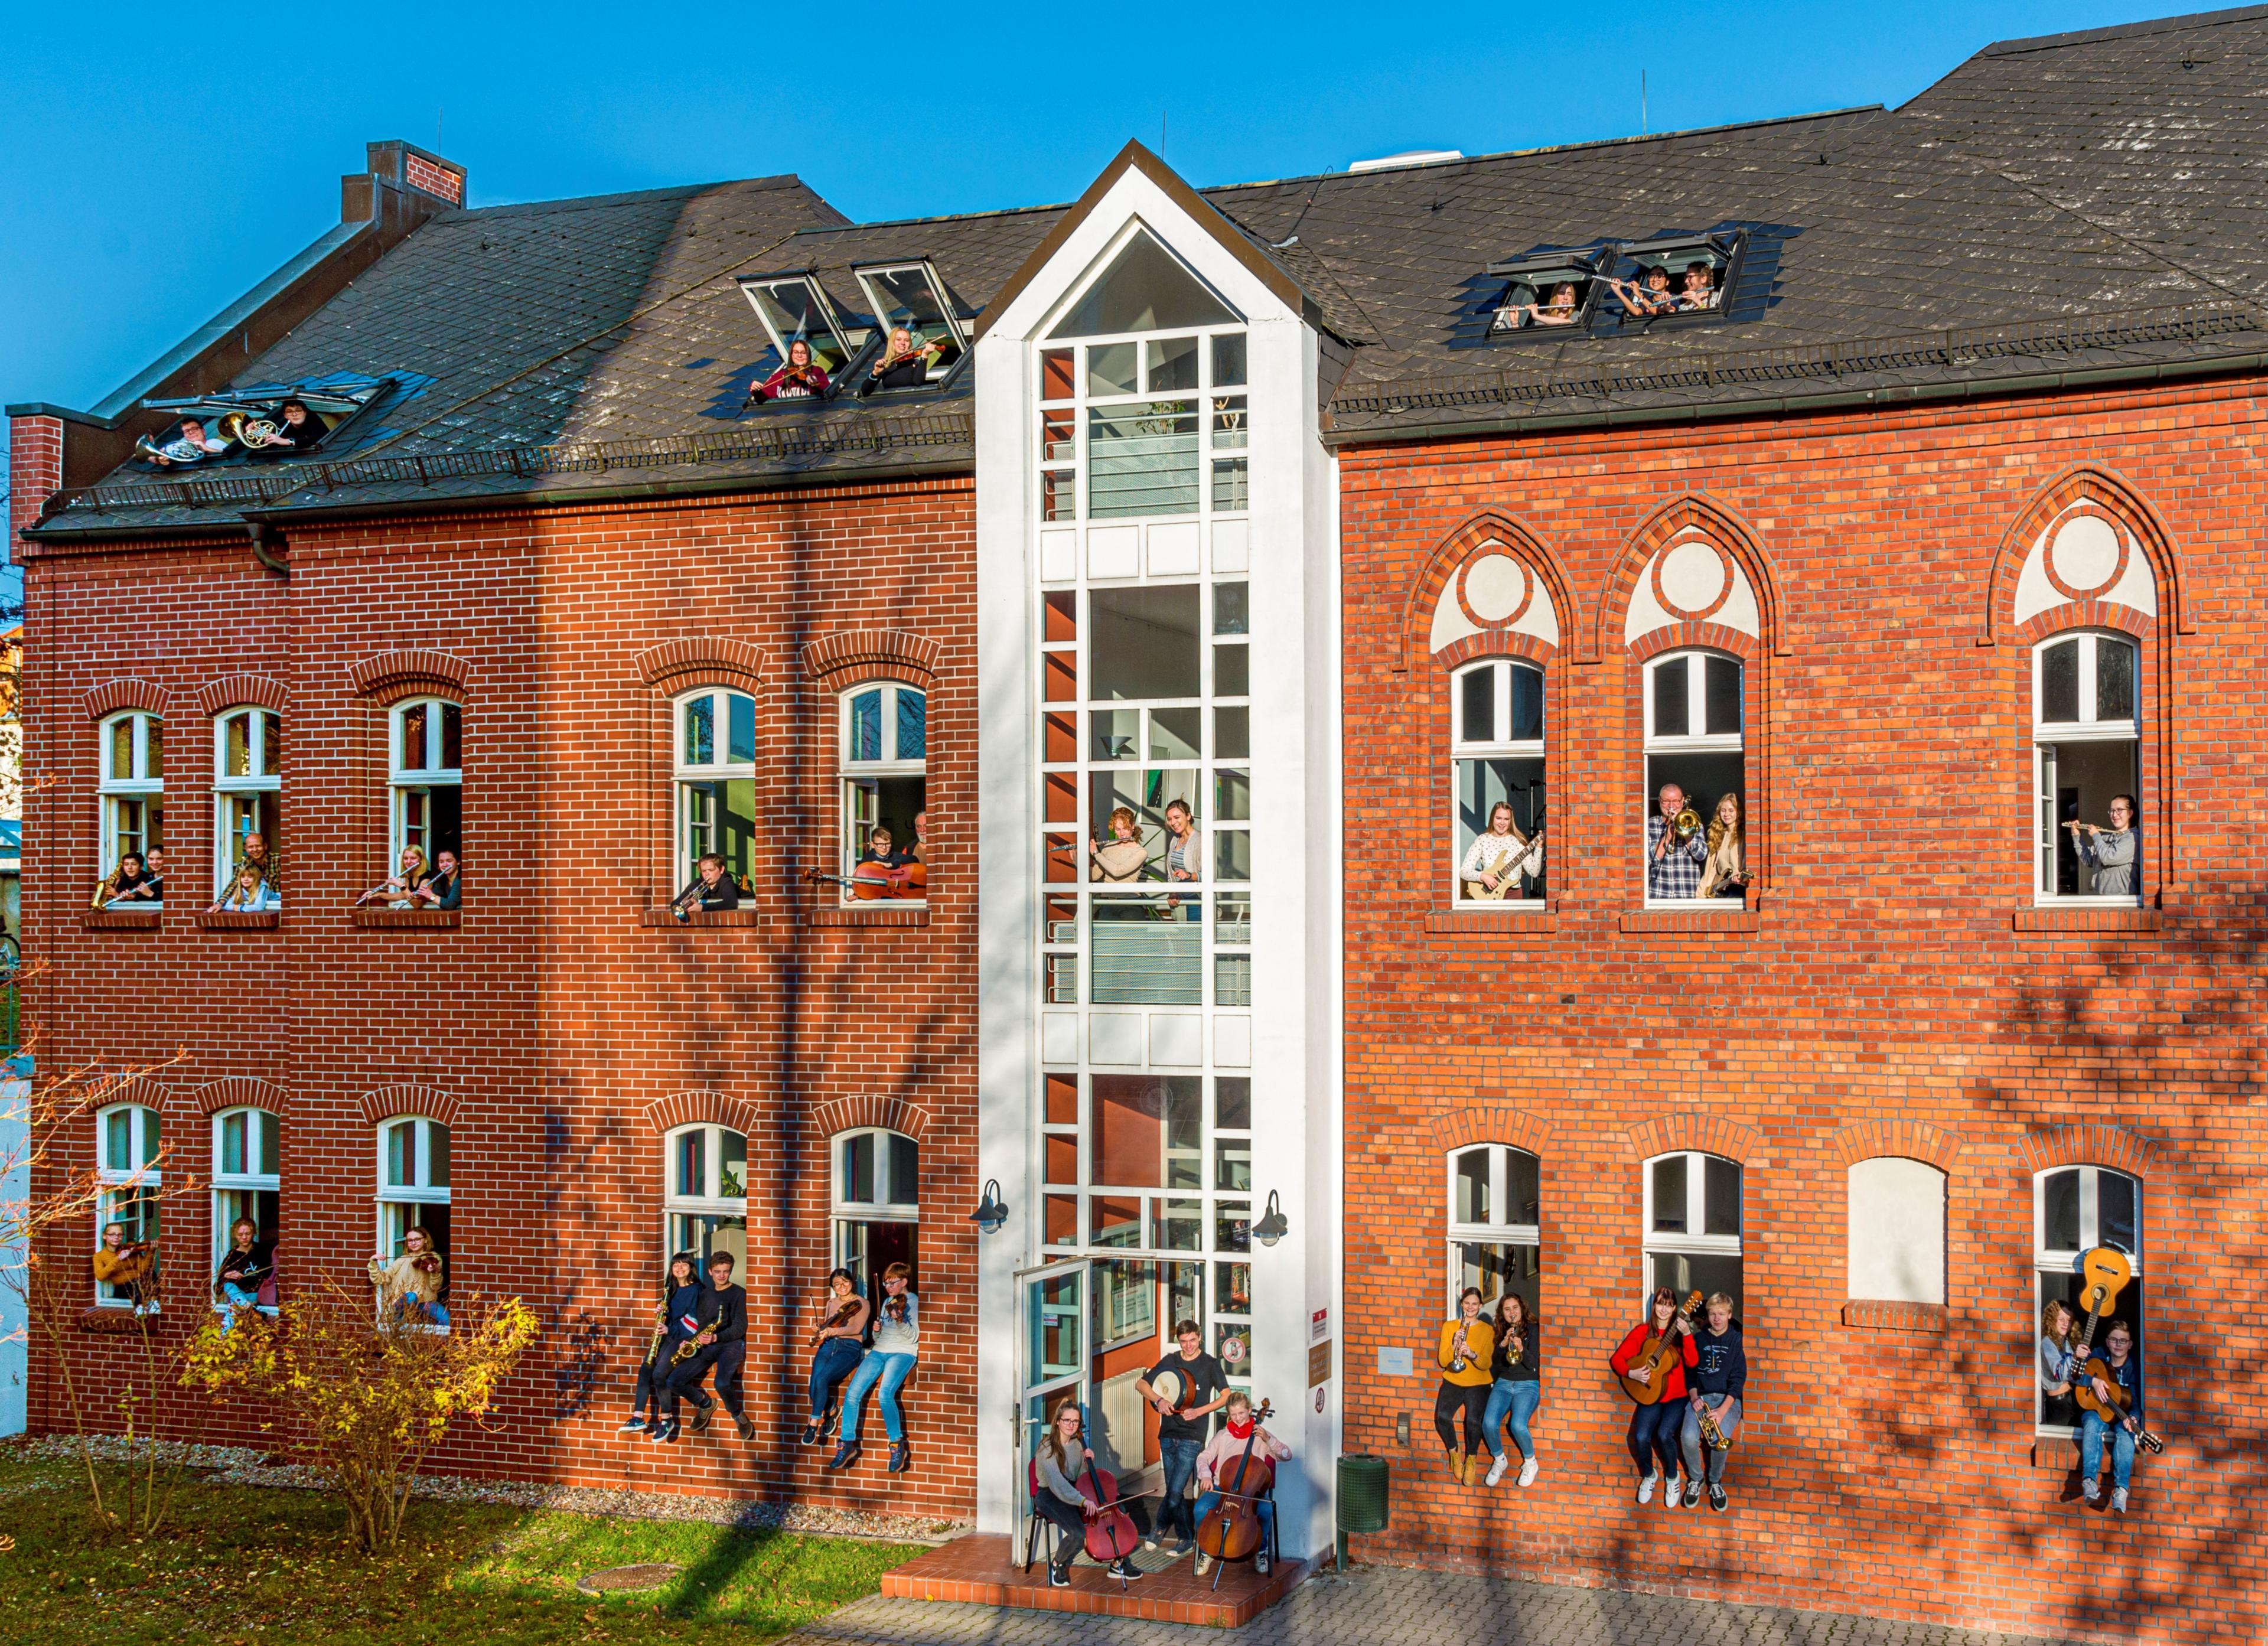 Kreismusikschule Uckermark in Prenzlau